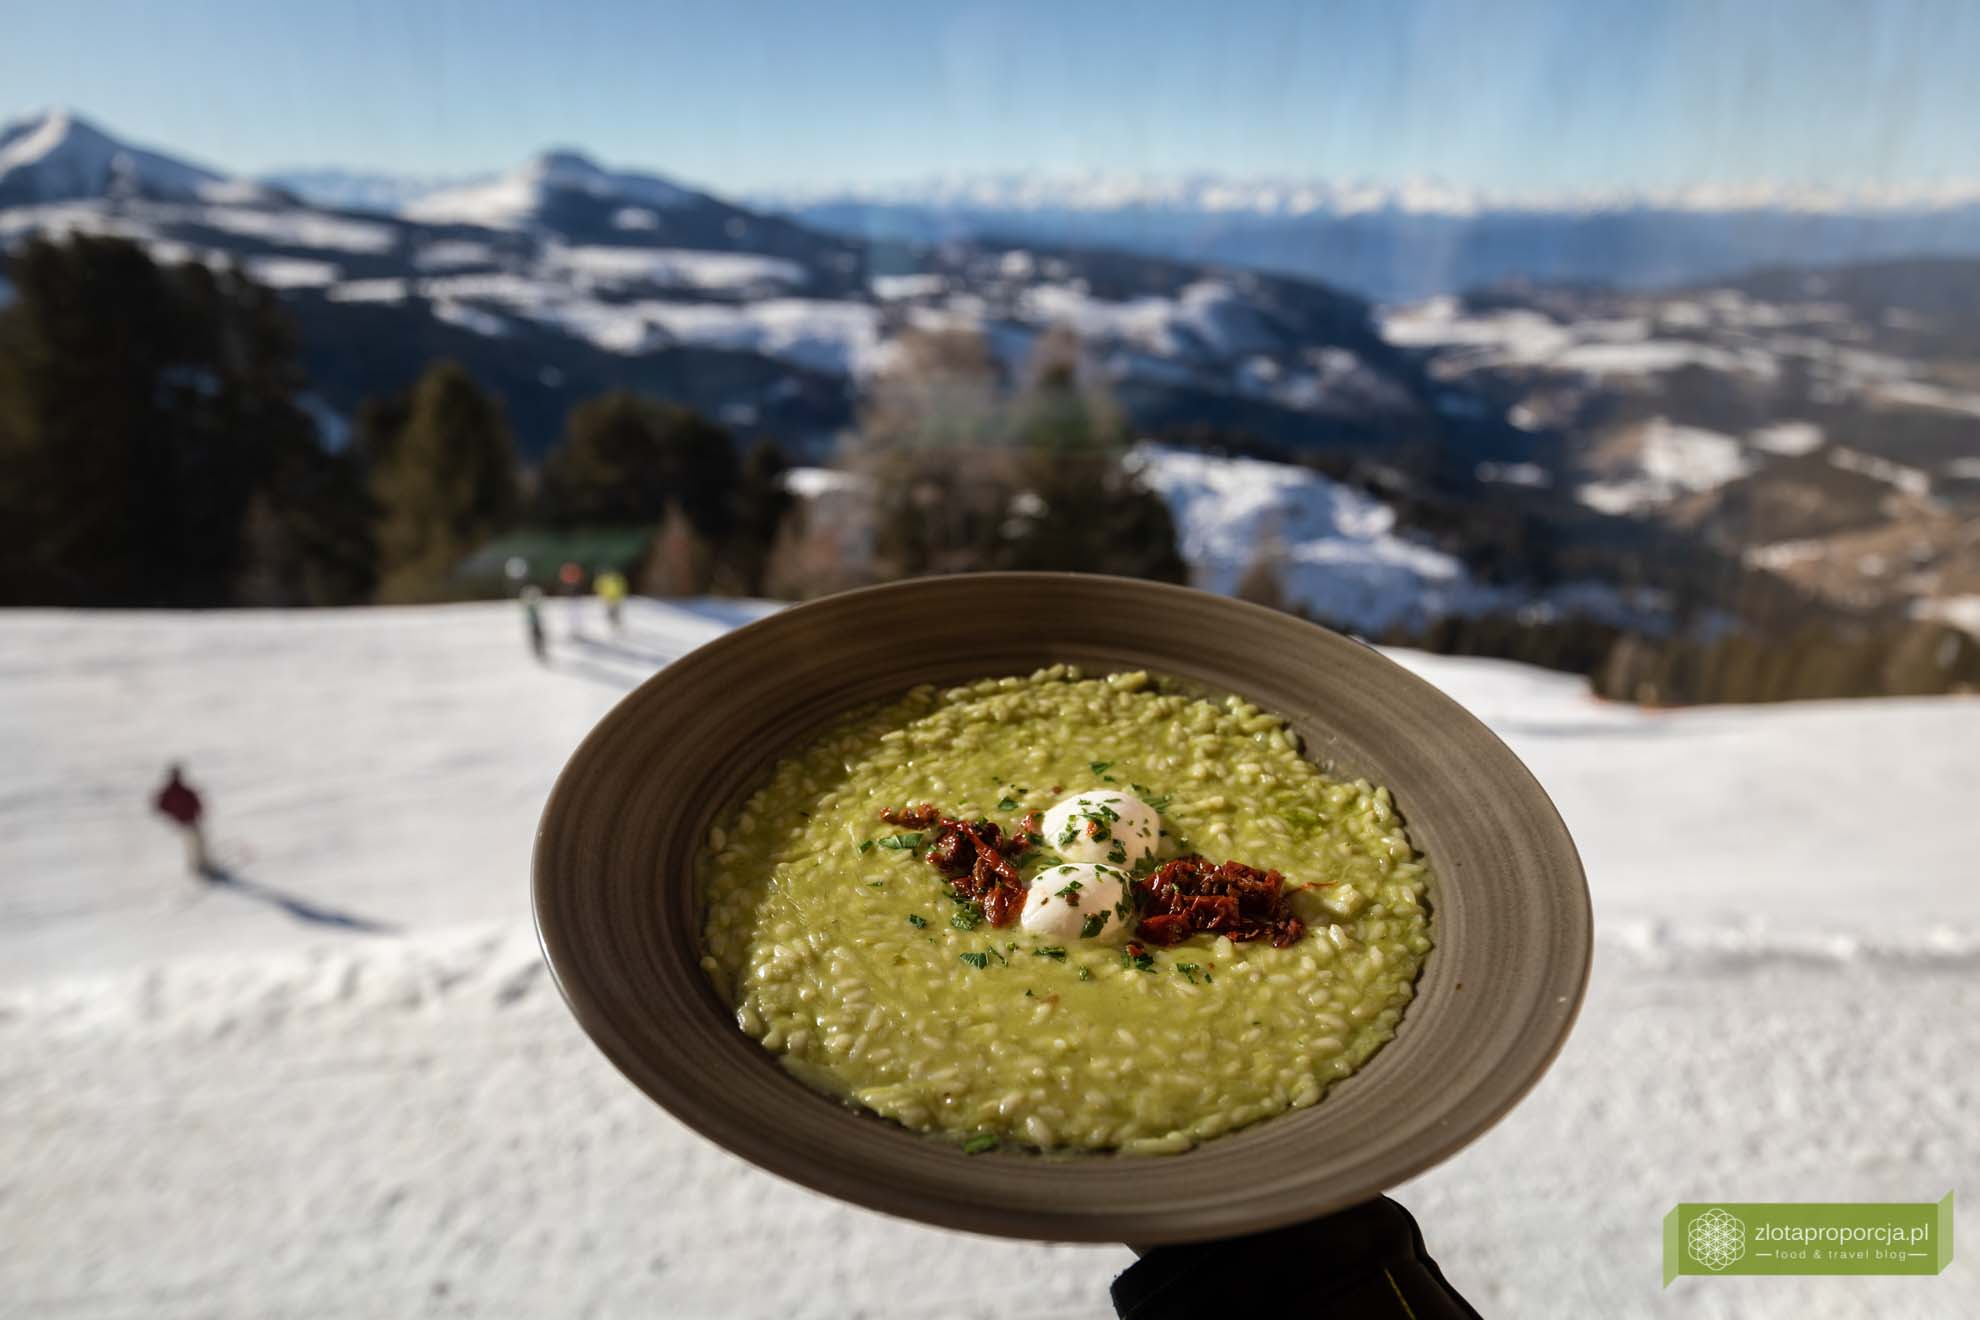 Południowy Tyrol; Val d'Ega; Eggental; Dolomity; narty Południowy Tyrol; Obereggen; Ski Center Obereggen; ośrodek narciarski Obereegen; narty Obereggen; Oberegen narty; Obereggen ski; Oberholz; Oberholz Obereggen; schronisko Obereggen;